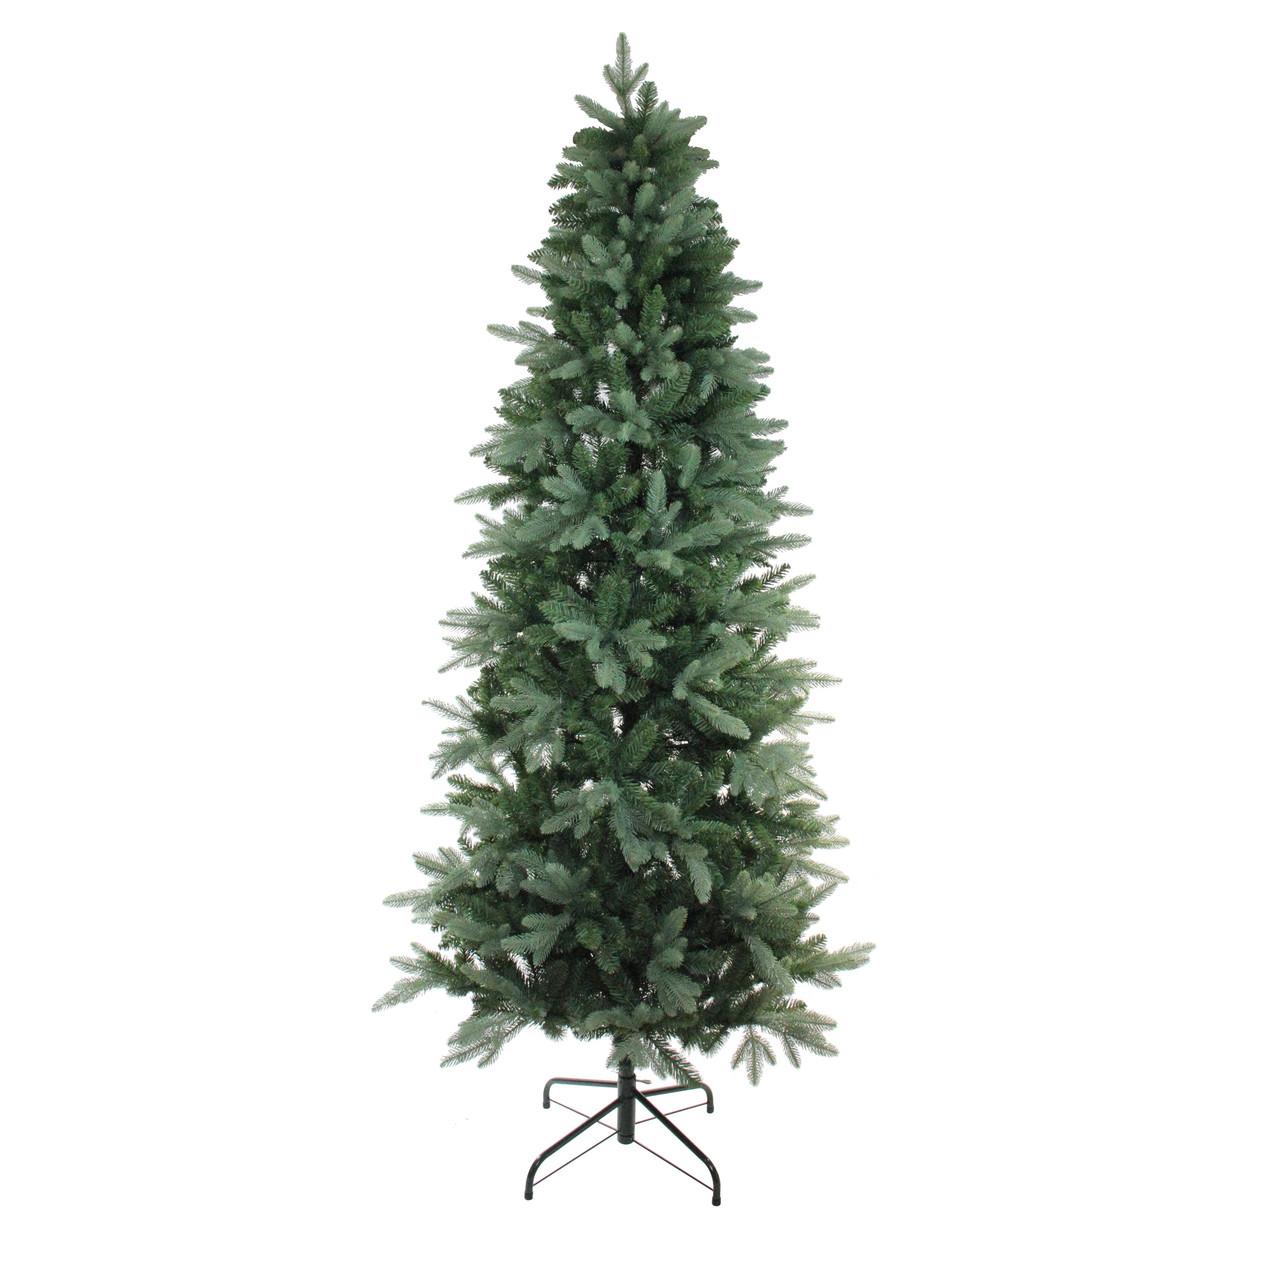 7 5 X 43 Washington Frasier Fir Slim Artificial Christmas Tree Unlit 32632667